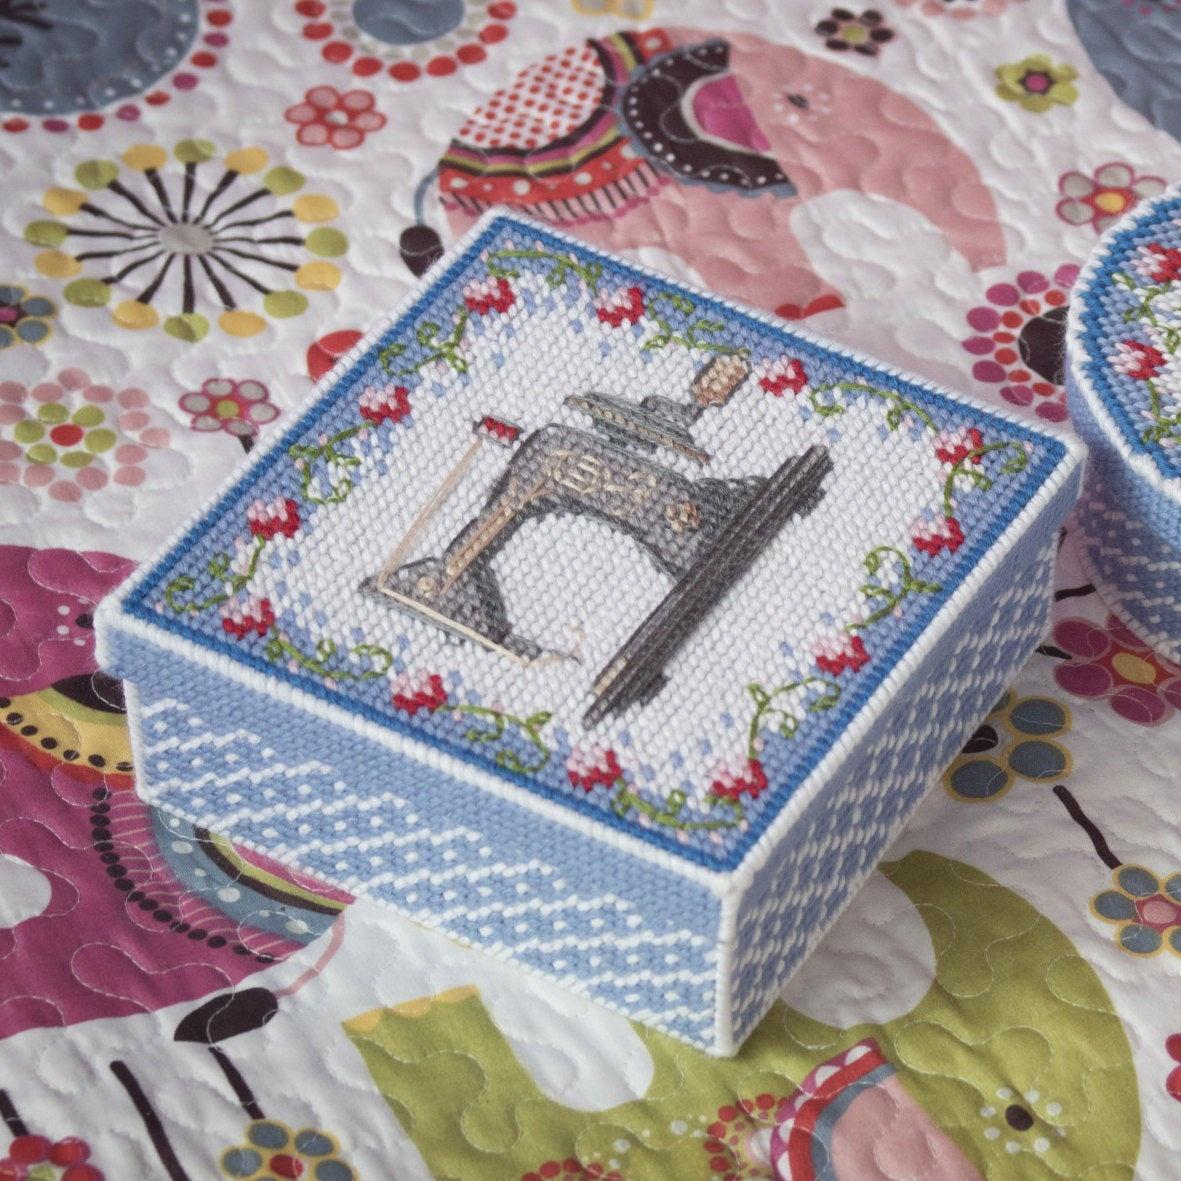 Box Plastic Canvas Patterns Free Tissue Box Cross Stitch | Etsy - Free Printable Plastic Canvas Tissue Box Patterns